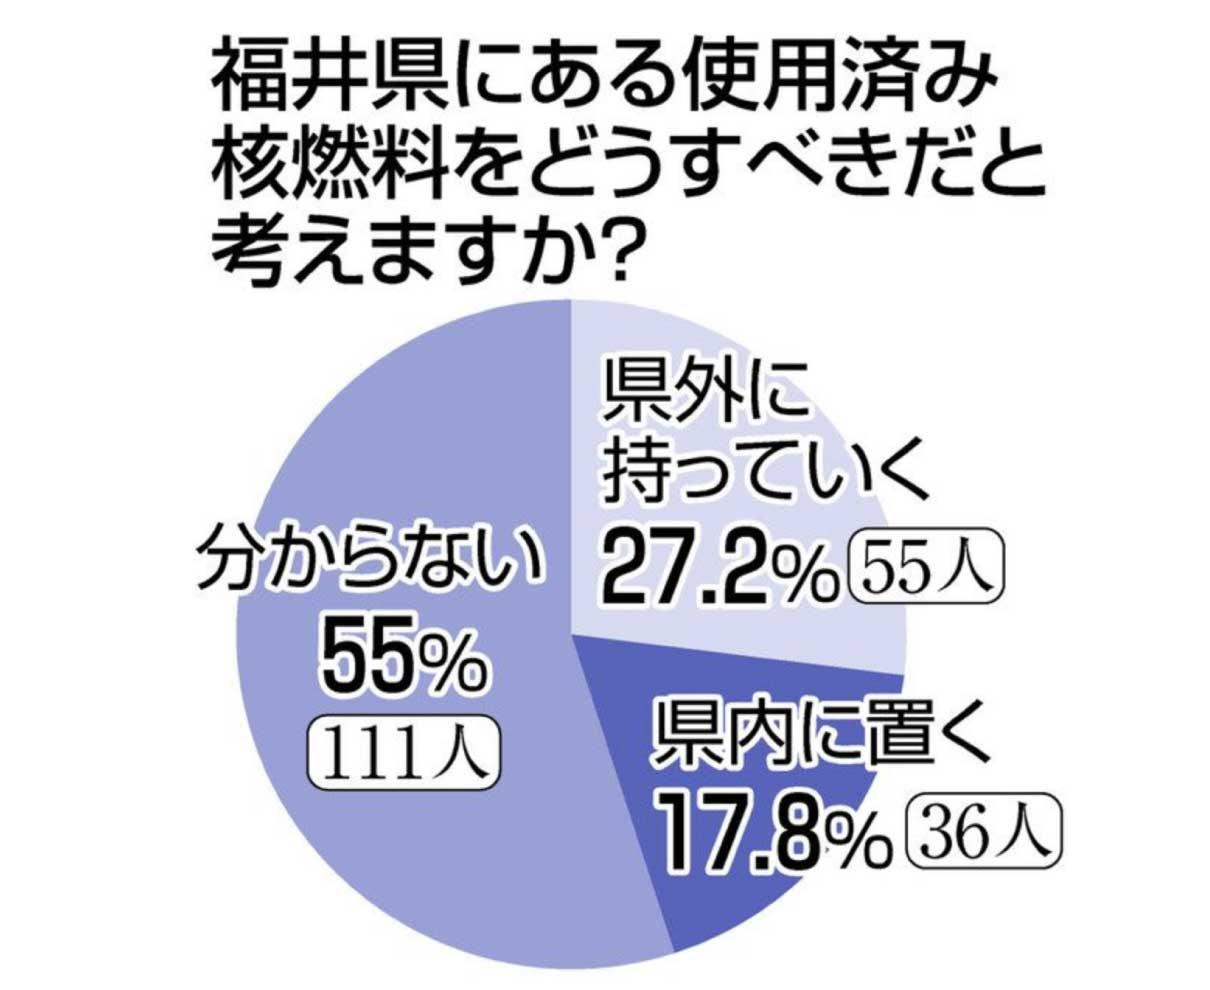 核燃料搬出 県民に」迷い 県外 27.2% 県内 17.8%